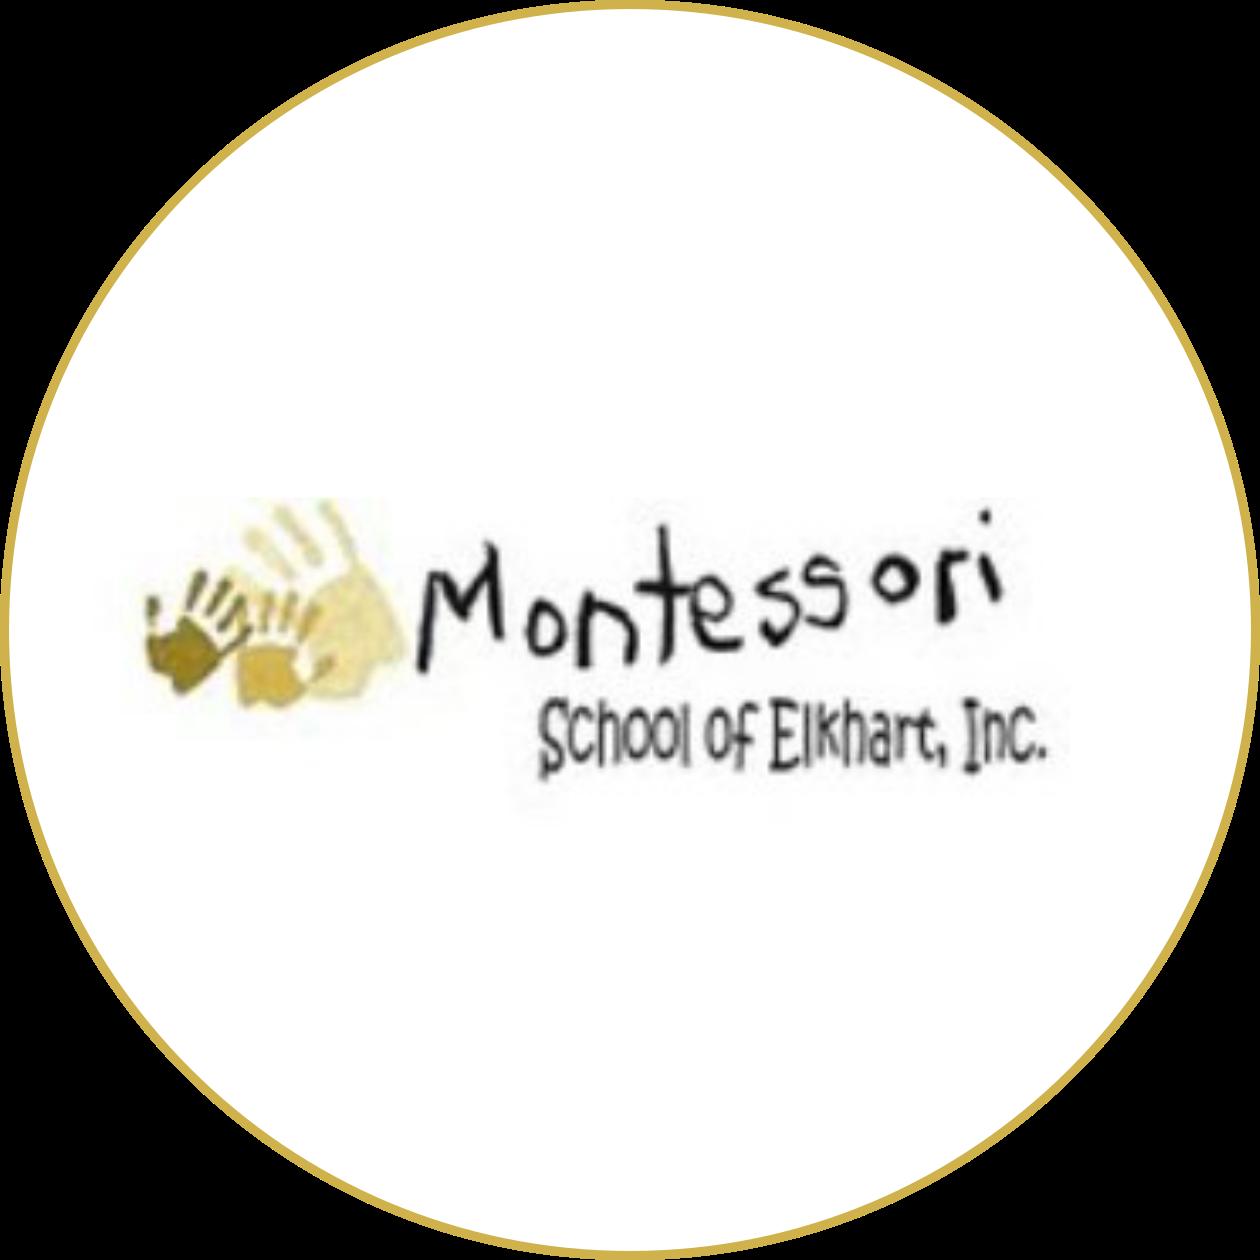 Montessori School of Elkhart - Elkhart, IndianaFull Member